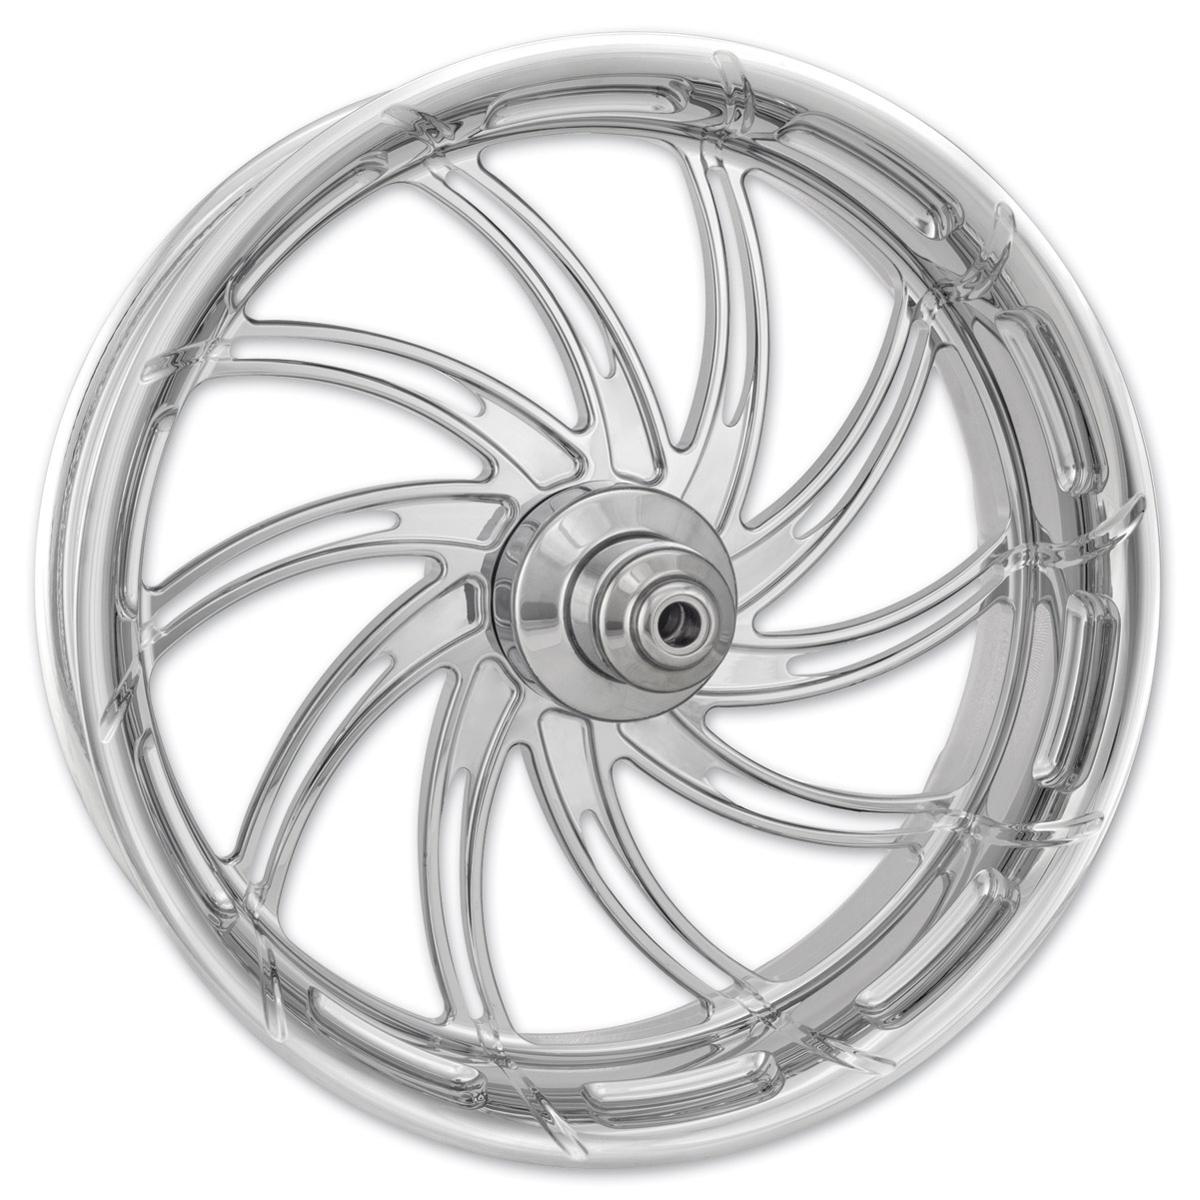 Performance Machine Supra Chrome Front Wheel 21x3.5 Non-ABS